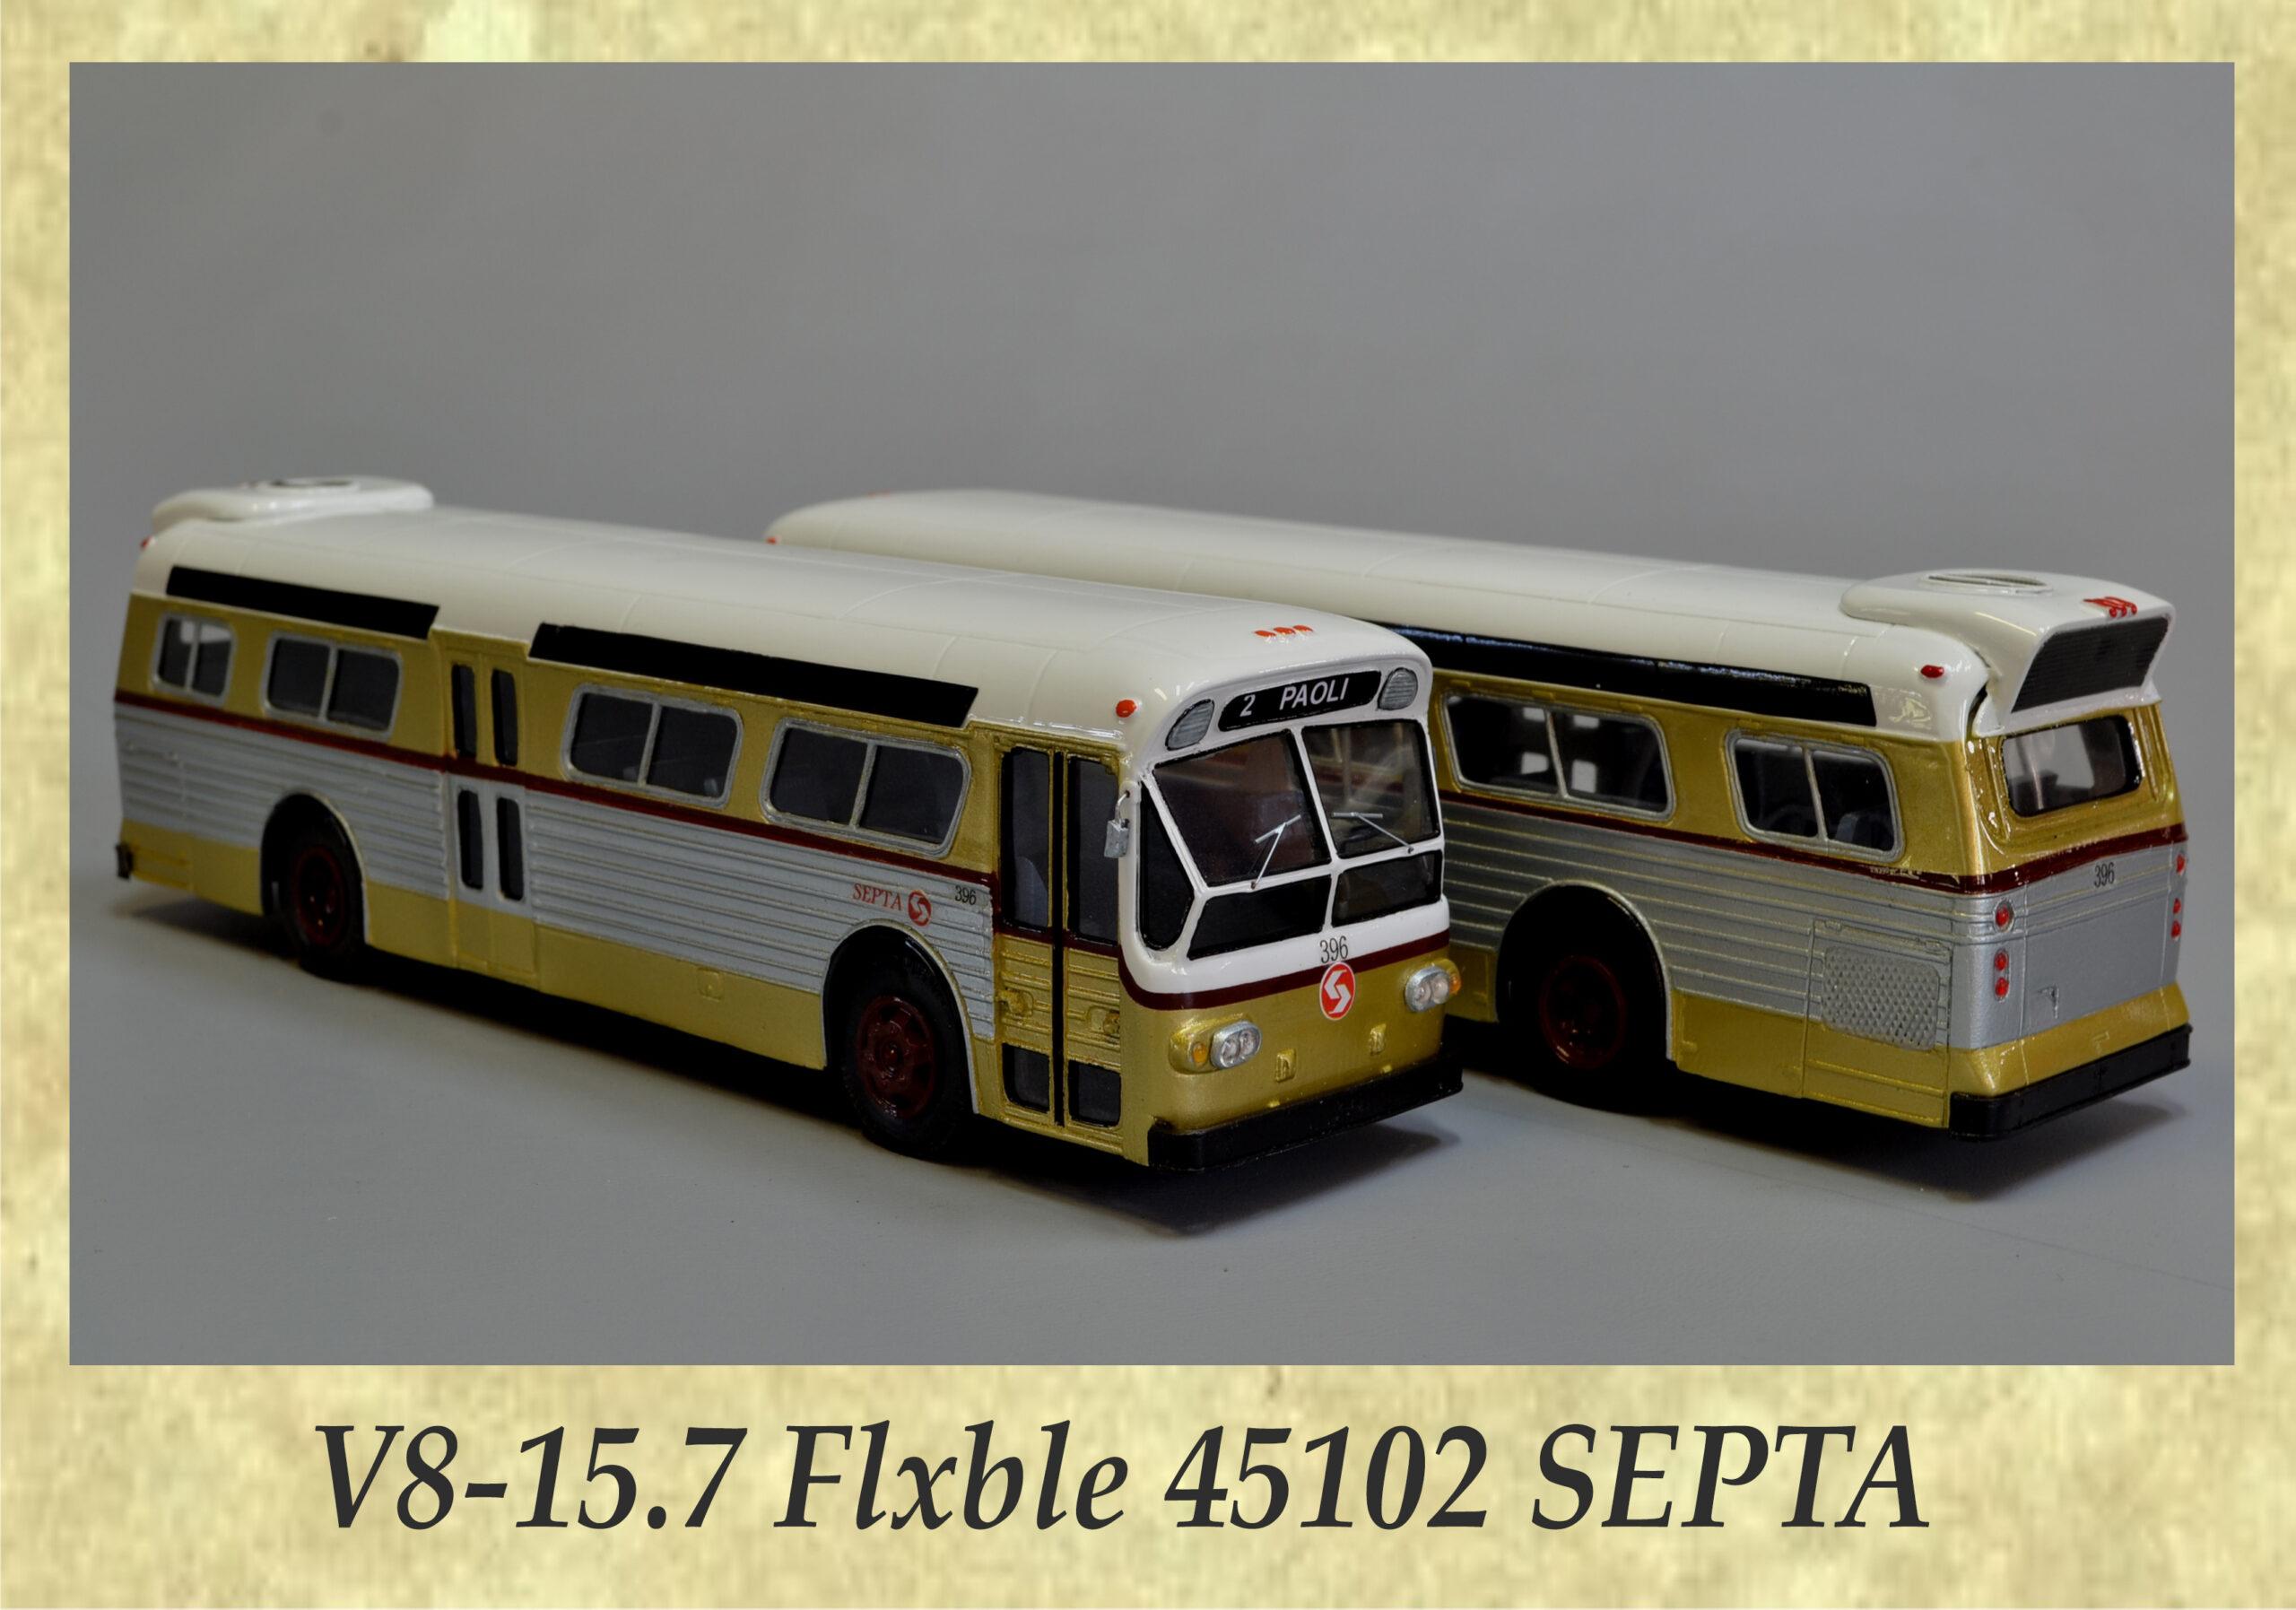 V8-15.7 Flxble 45102 SEPTA